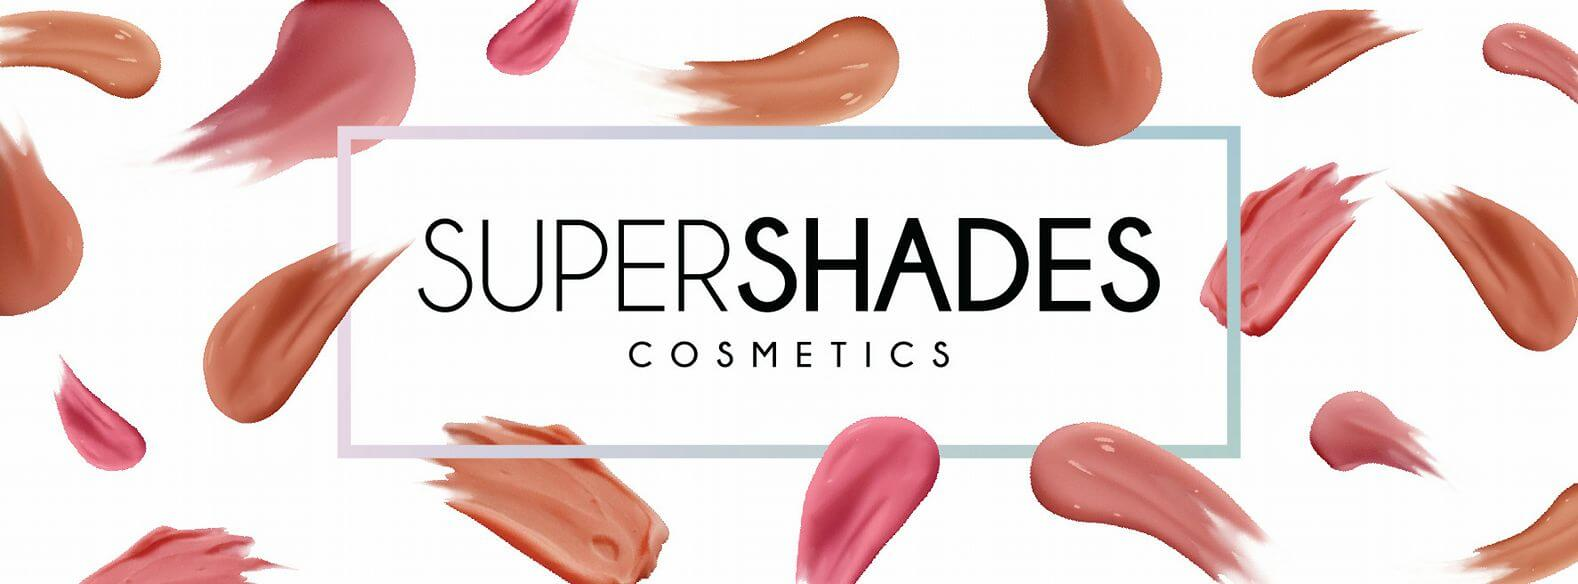 SuperShades ลิป , SuperShades ลิป รีวิว , SuperShades Mini Lip Matte , SuperShades ลิป 99 บาท , ซุปเปอร์เฉด มินิลิปแมท , Supershades  x  Savi